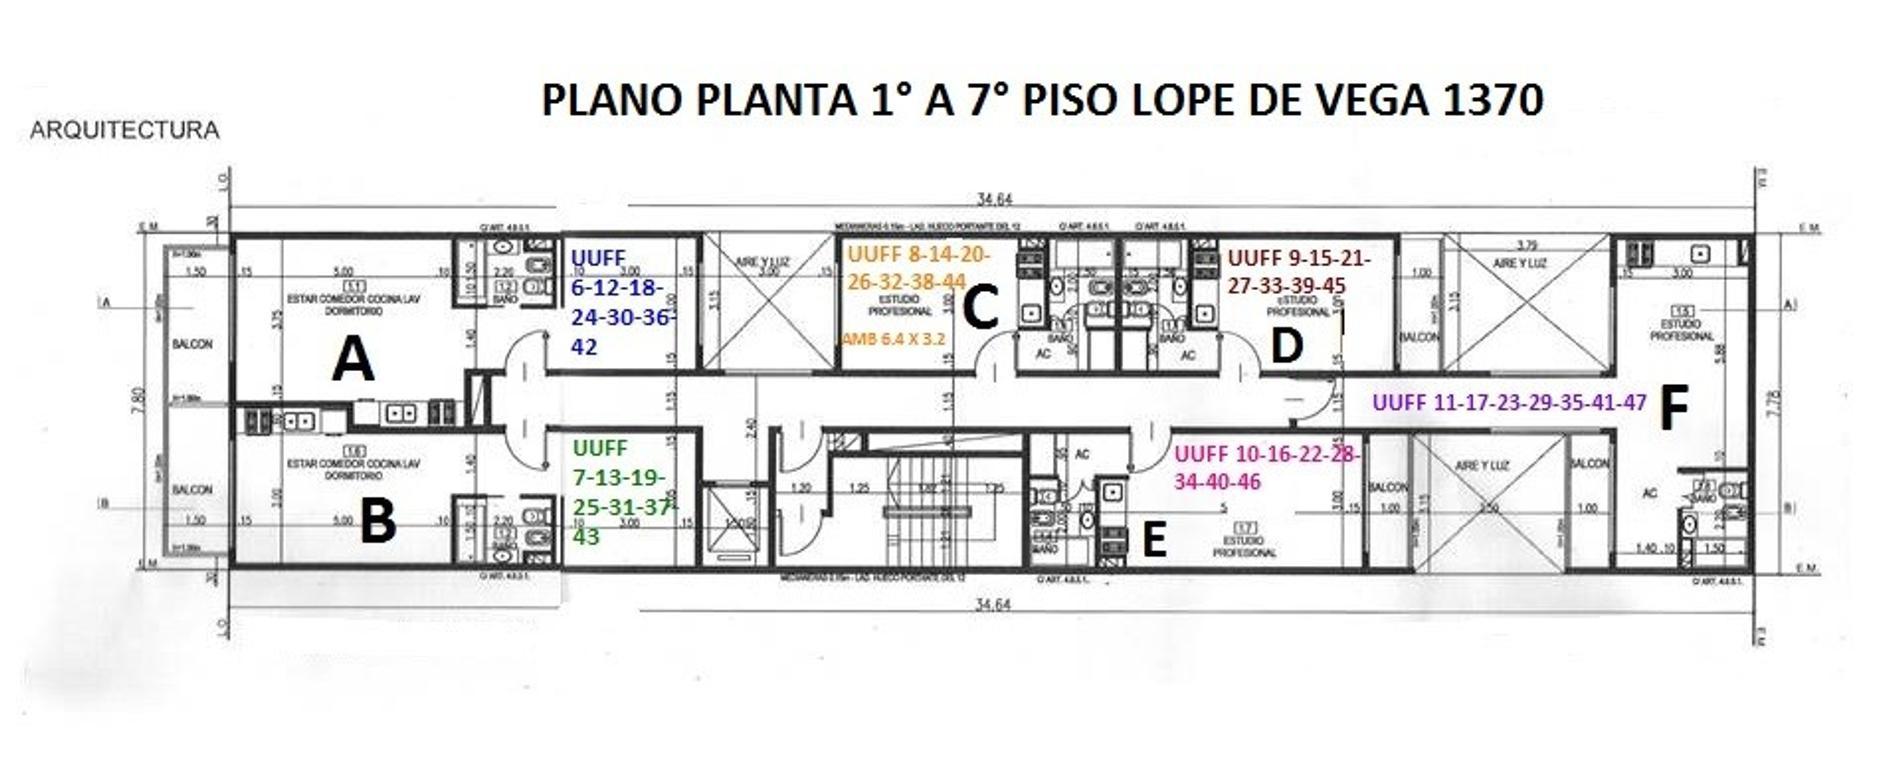 XINTEL(NIR-NIR-1019) Departamento - Venta - Argentina, Capital Federal - AV. LOPE DE VEGA  AL 1300